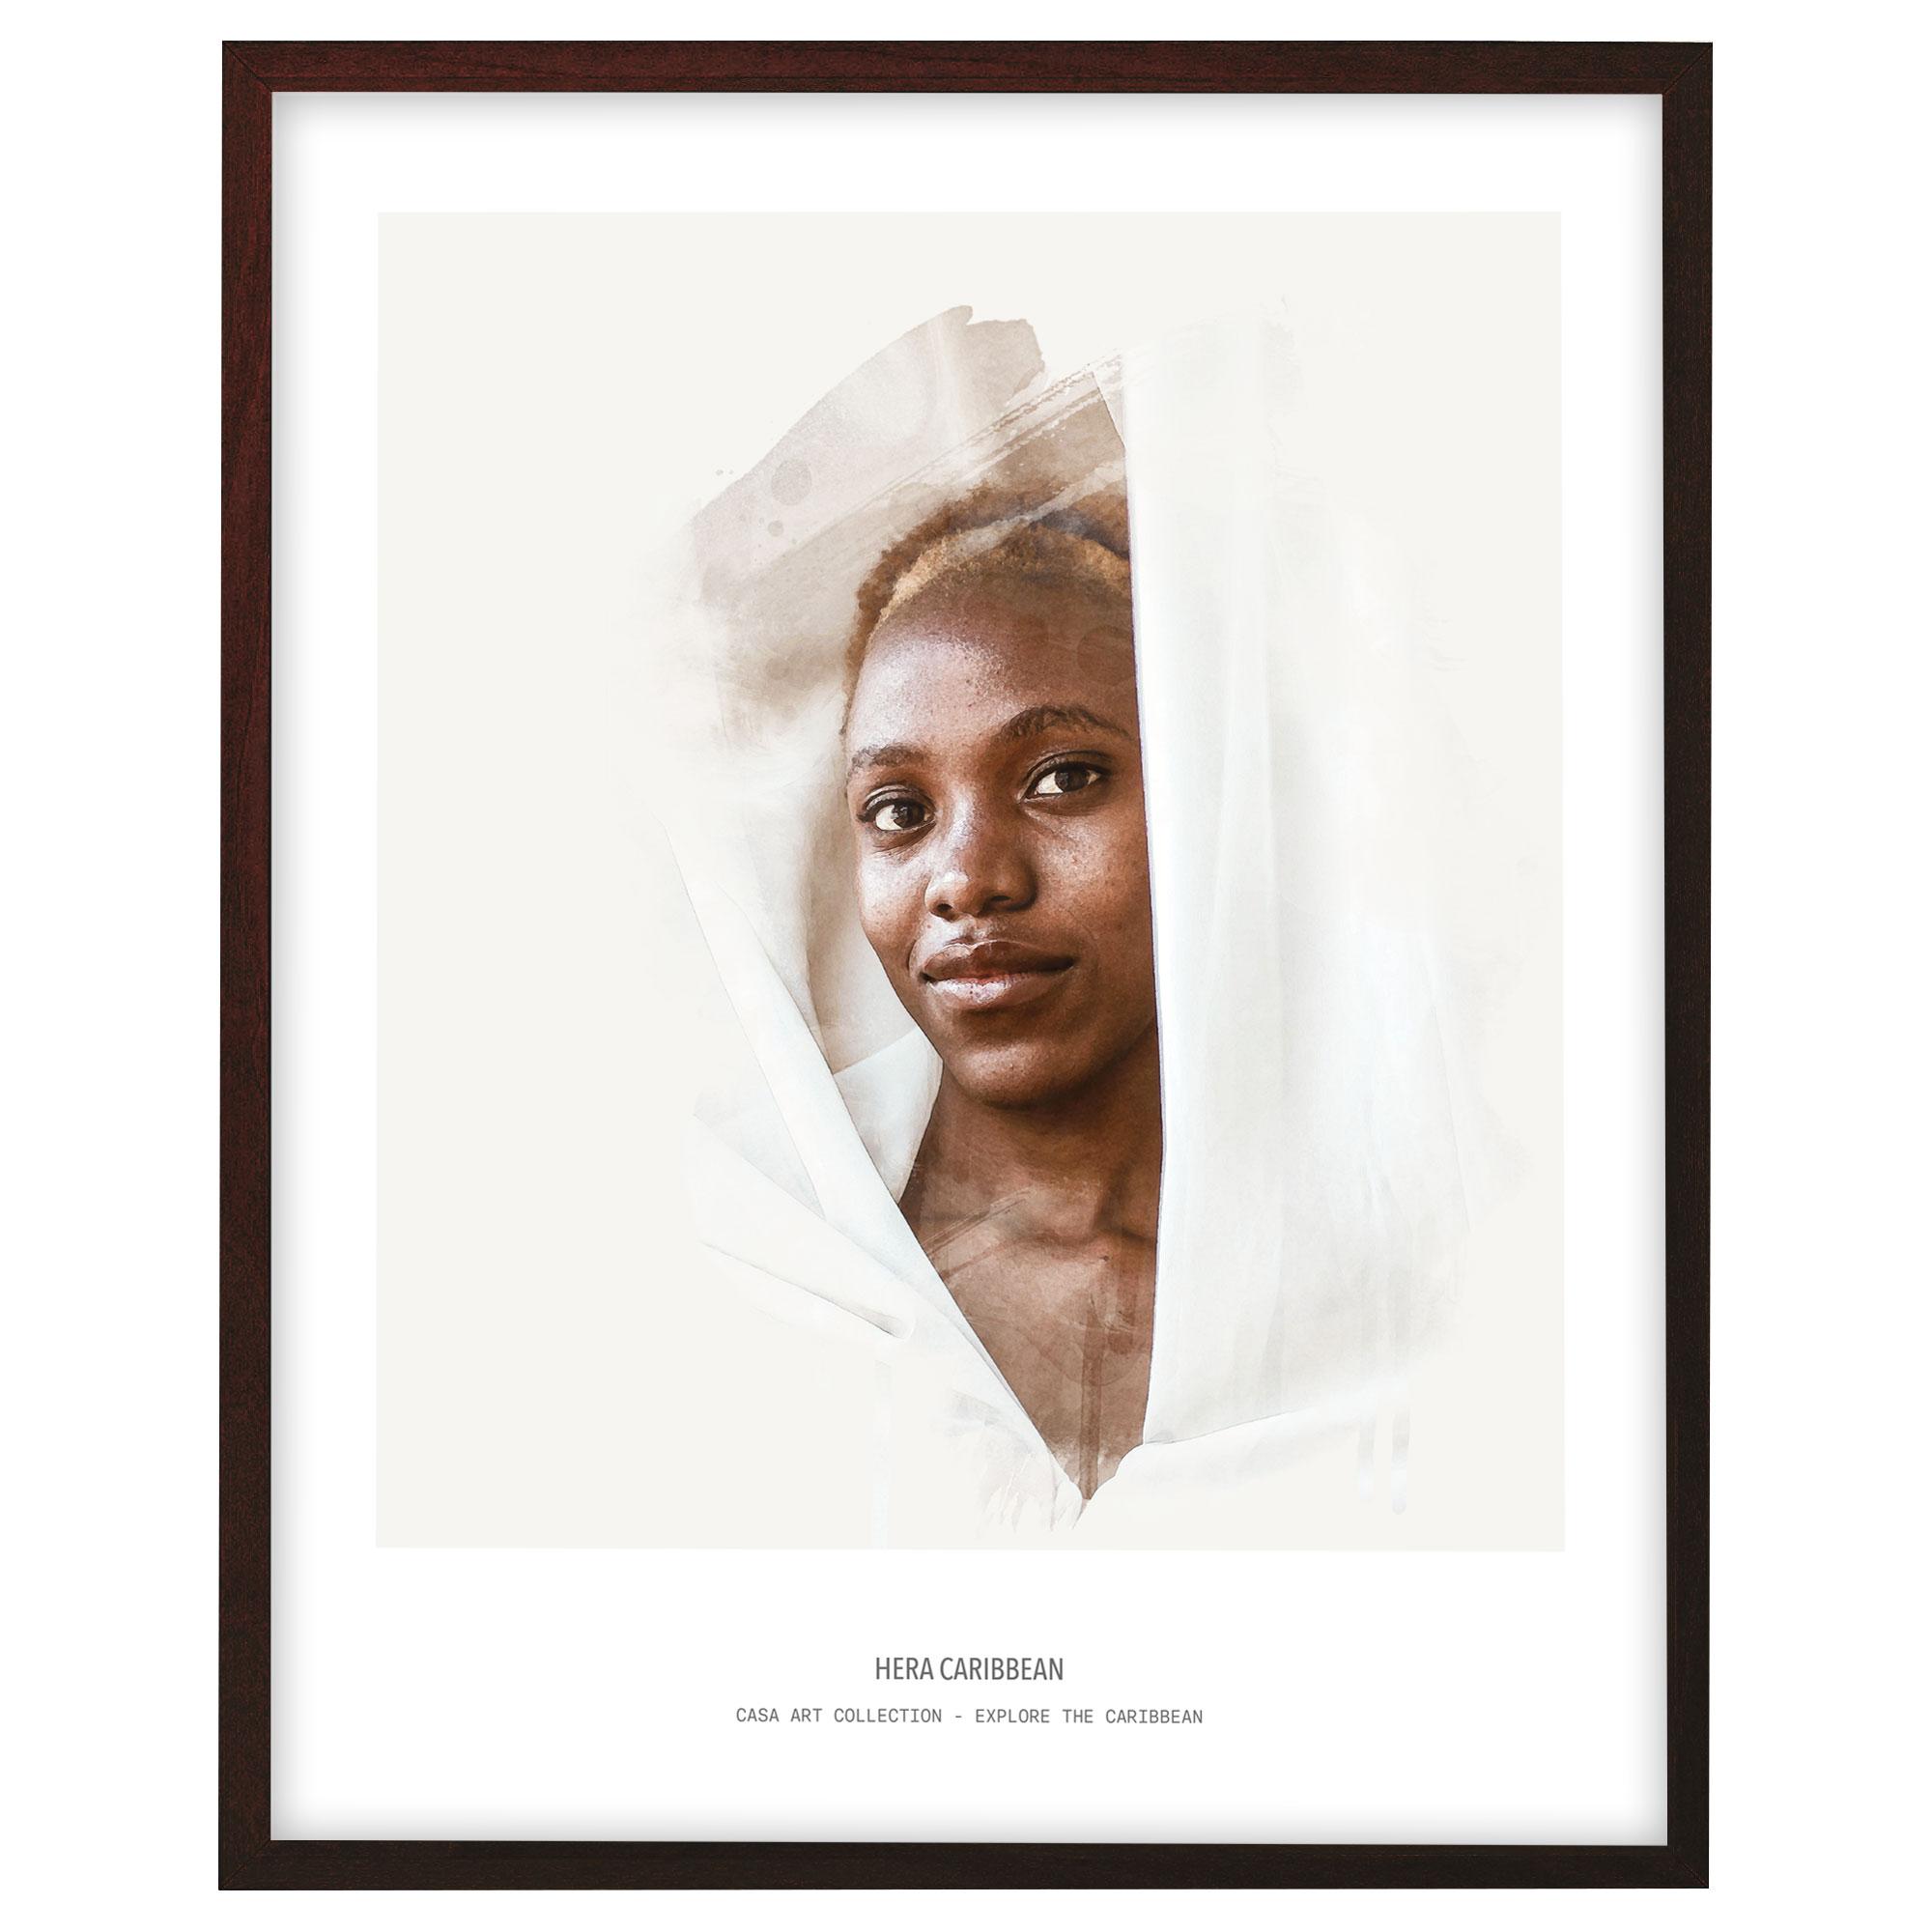 Hera Caribbean - Fine Art Printing - Explore the Caribbean